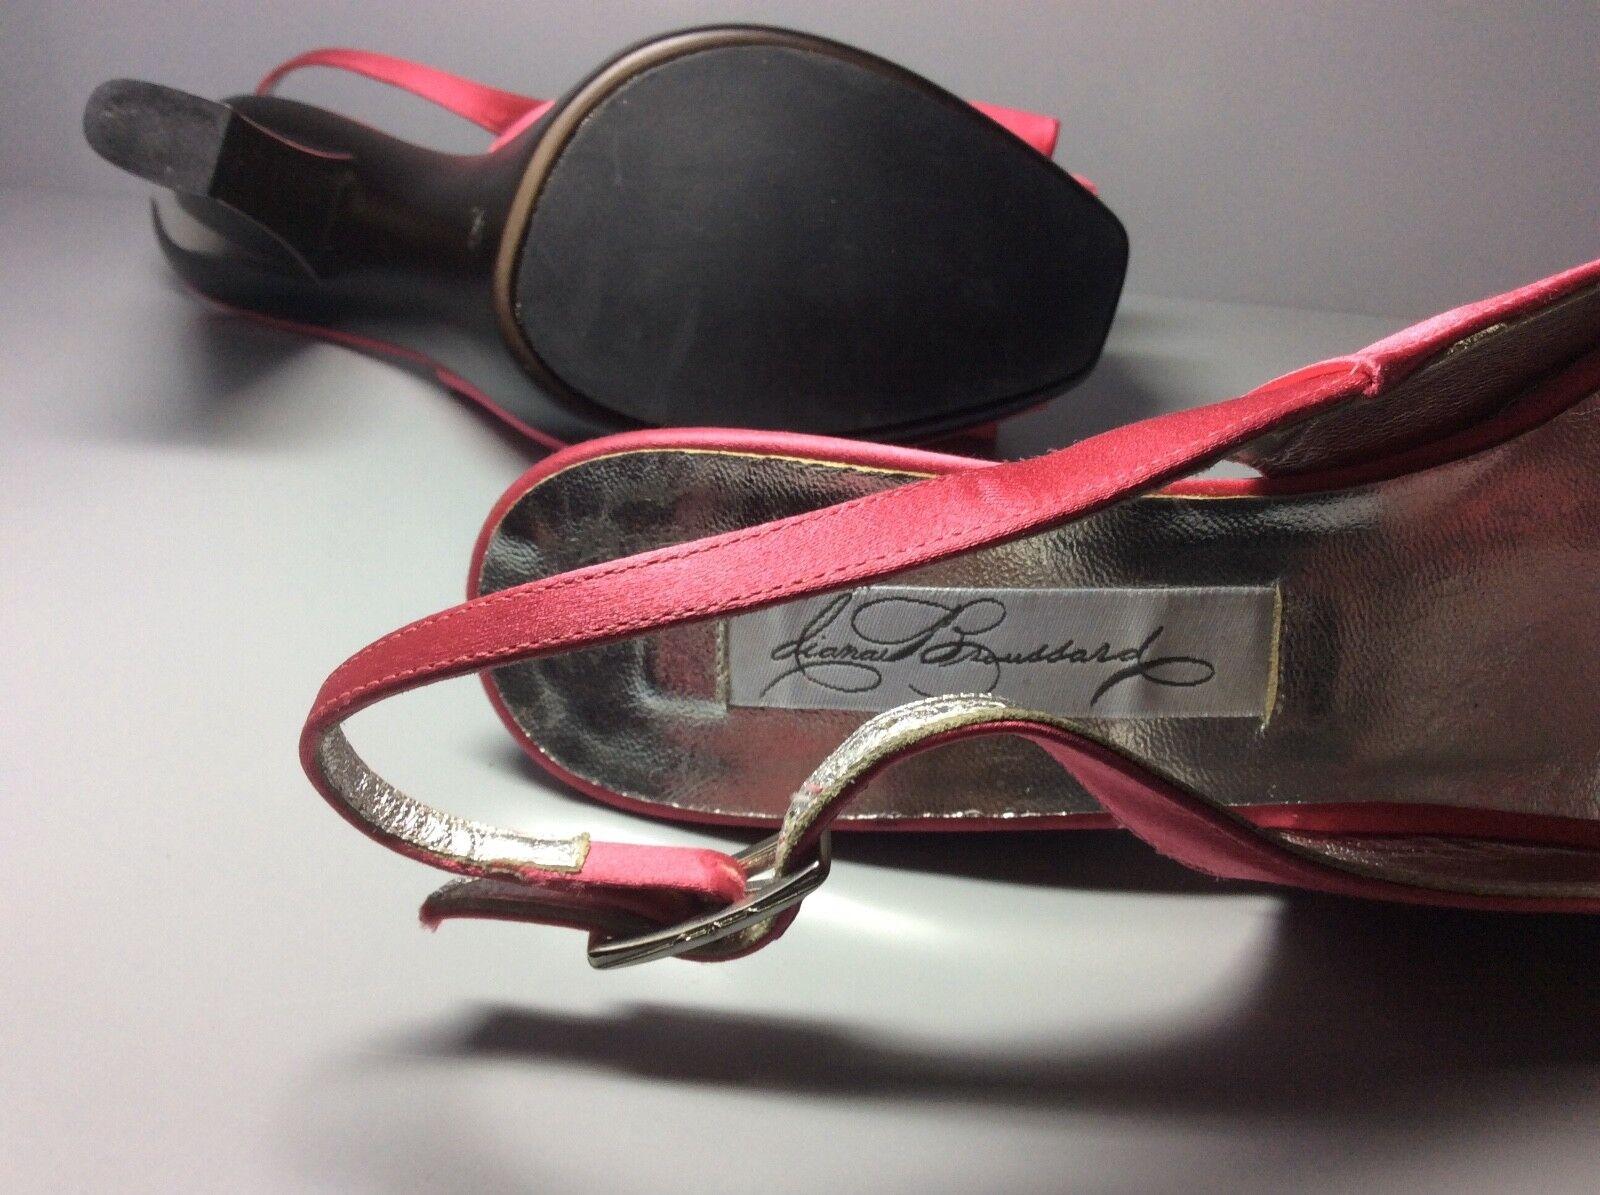 Damens's pink satin DIANA BROUSSARD heels Größe 39